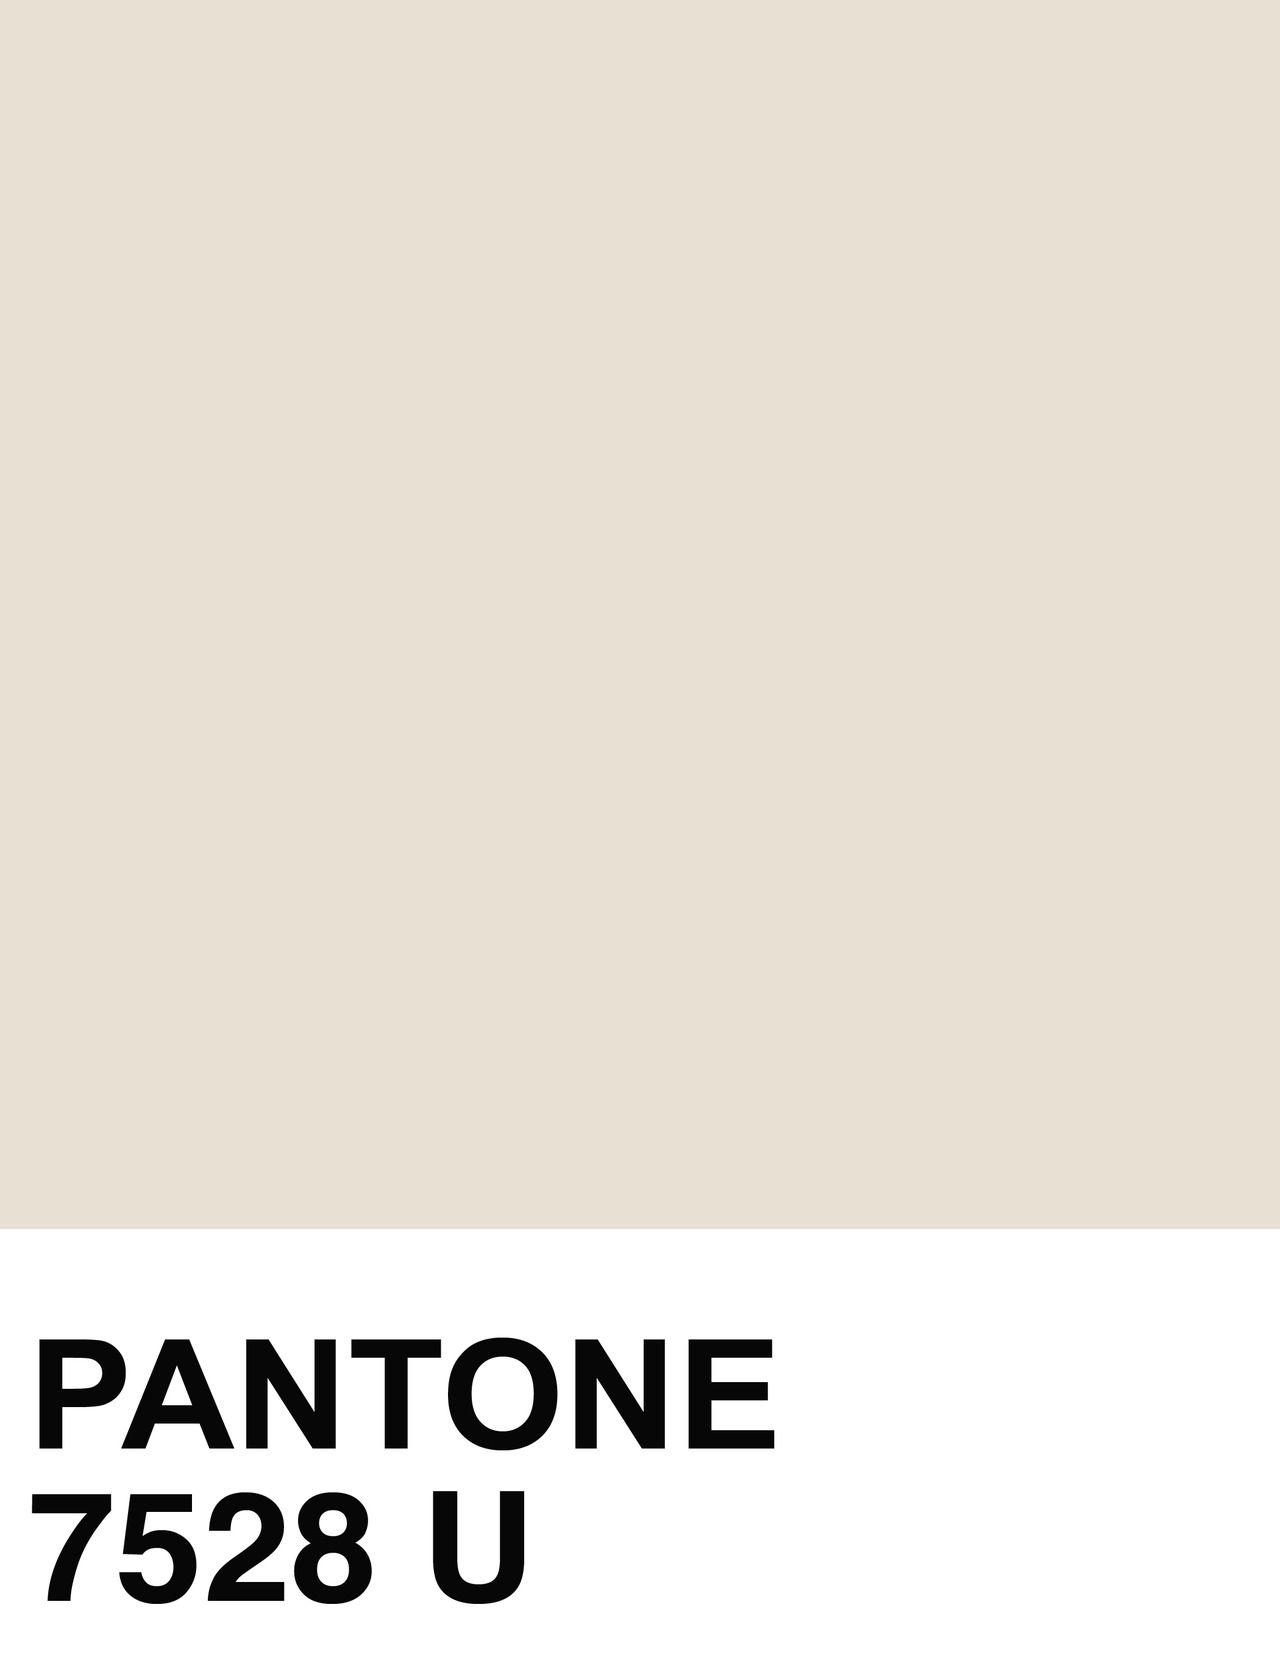 Pantone Solid Uncoated 7528 U | Pantone color - 3 | Pinterest | Pastell